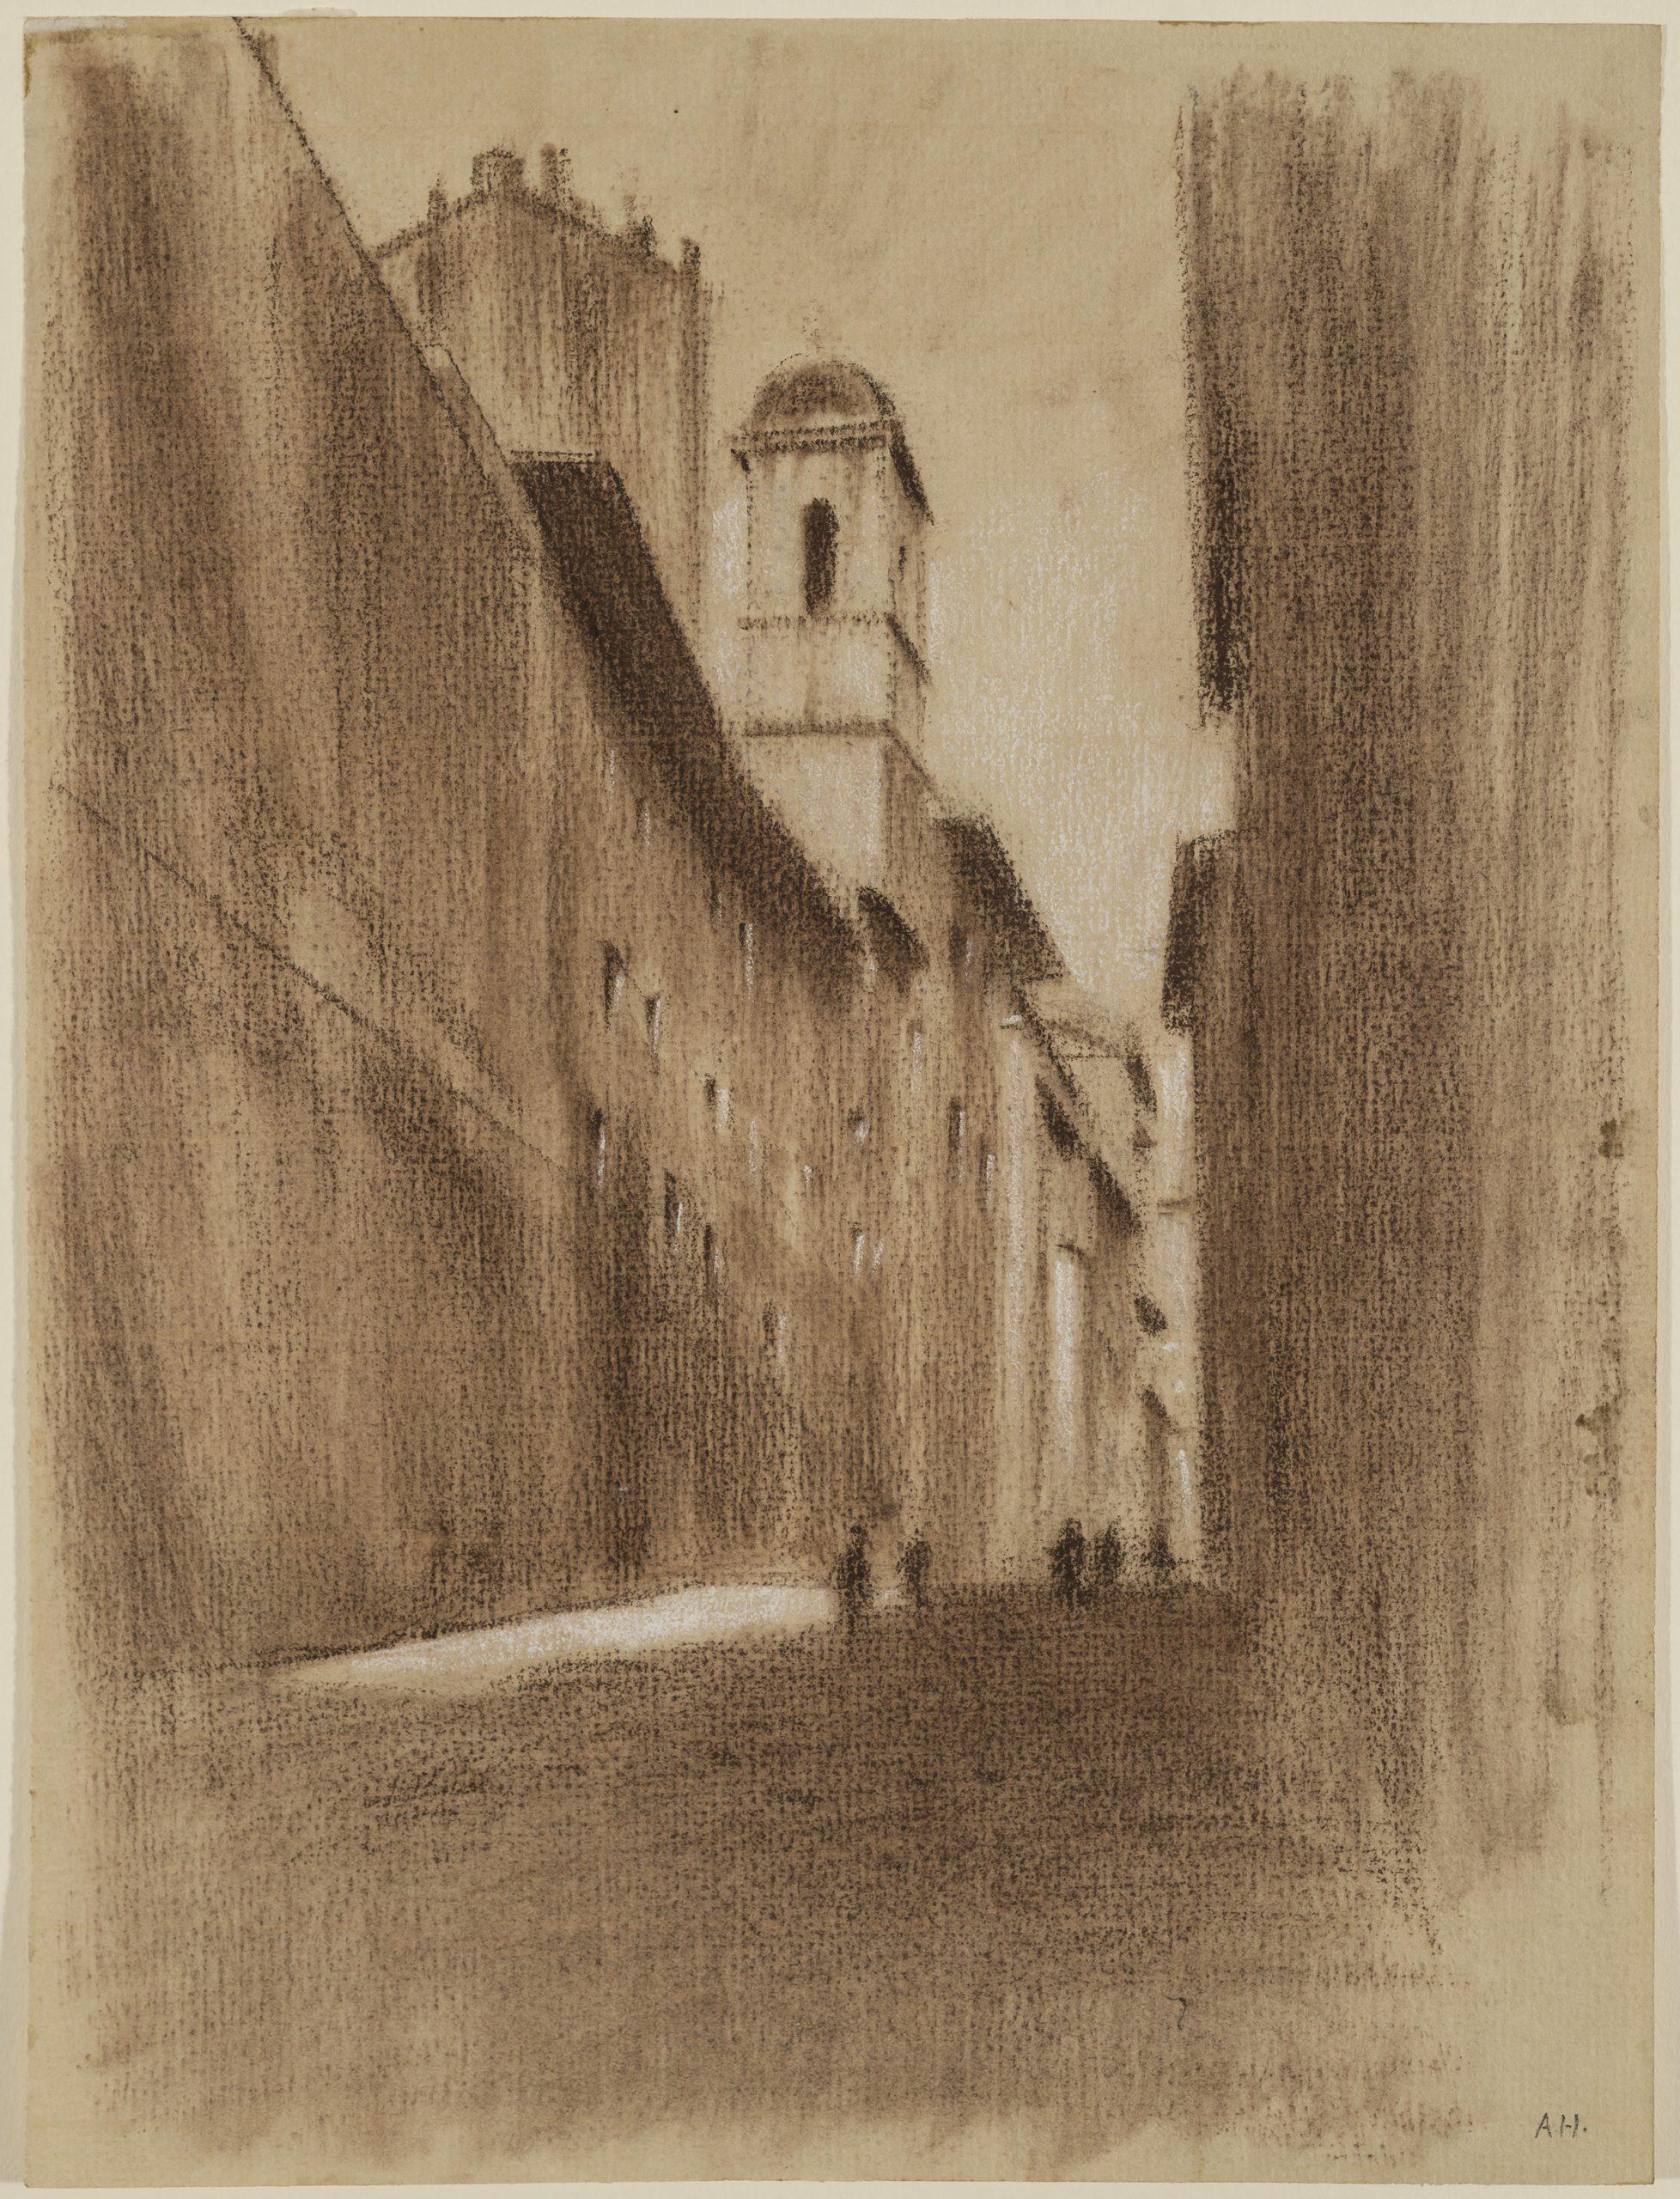 Alley Salita del Grillo in Rome by Adolf Hiremy-Hirschl